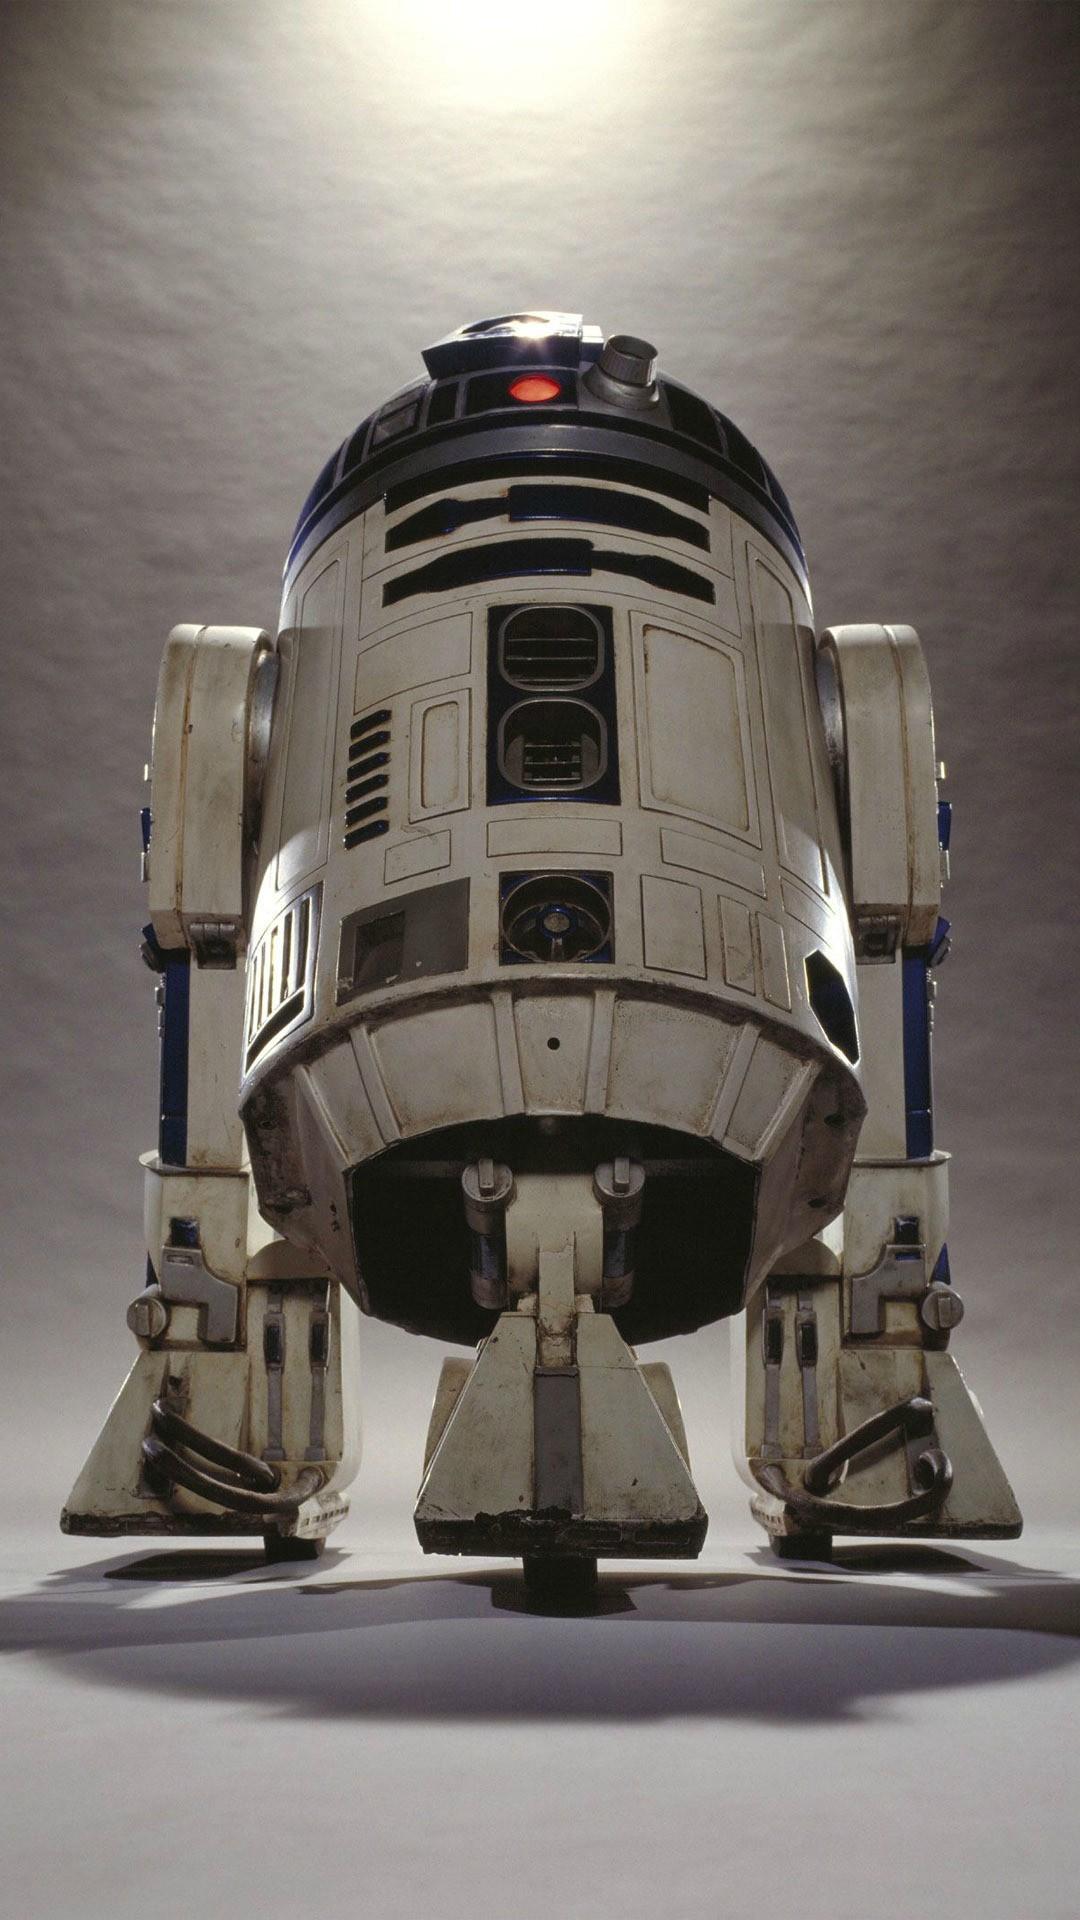 Star Wars R2d2 Beneath The Dome 1080x1920 Download Hd Wallpaper Wallpapertip